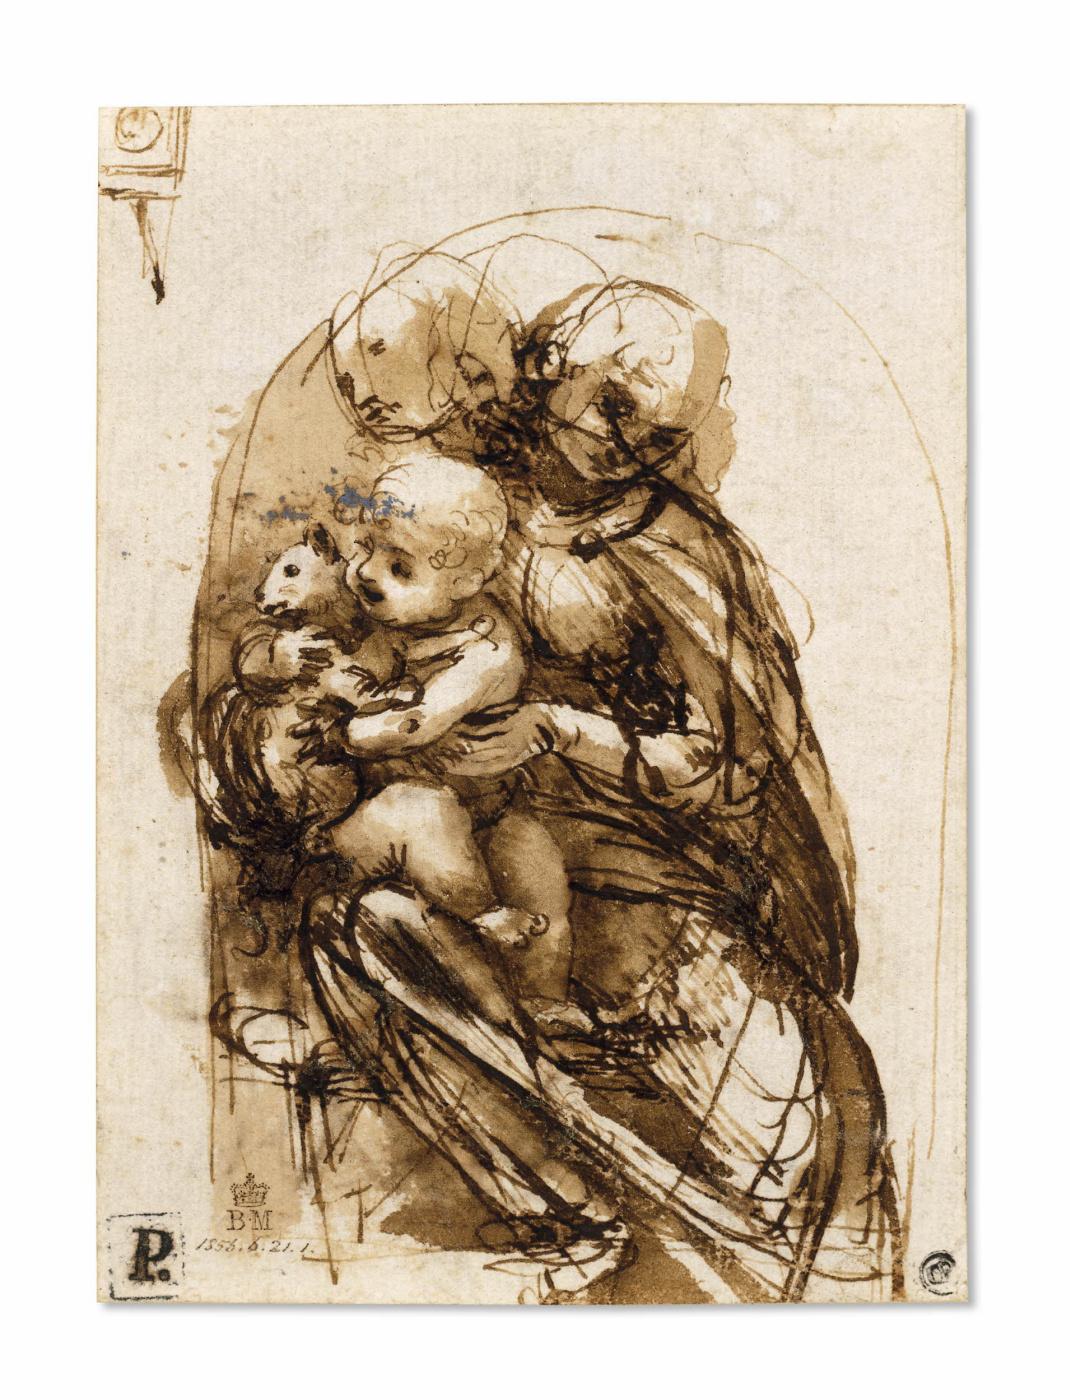 Leonardo da Vinci. Madonna and child with a cat (sketch)